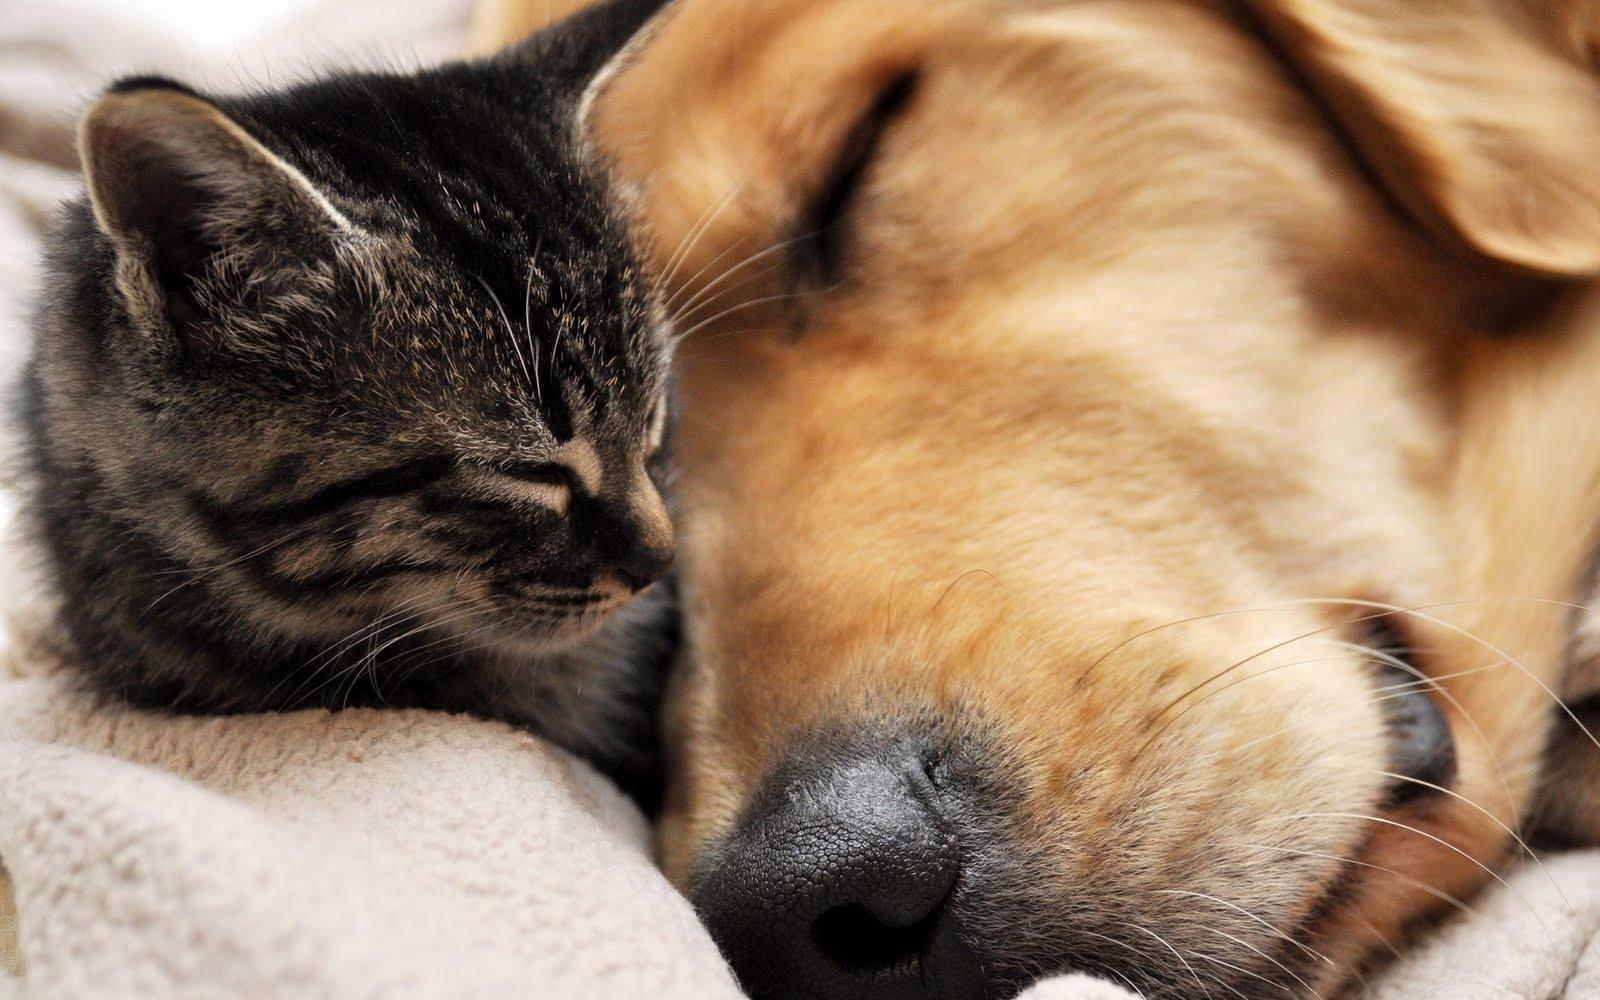 Similar Cute cat and dog wallpaper dowload 1600x1000